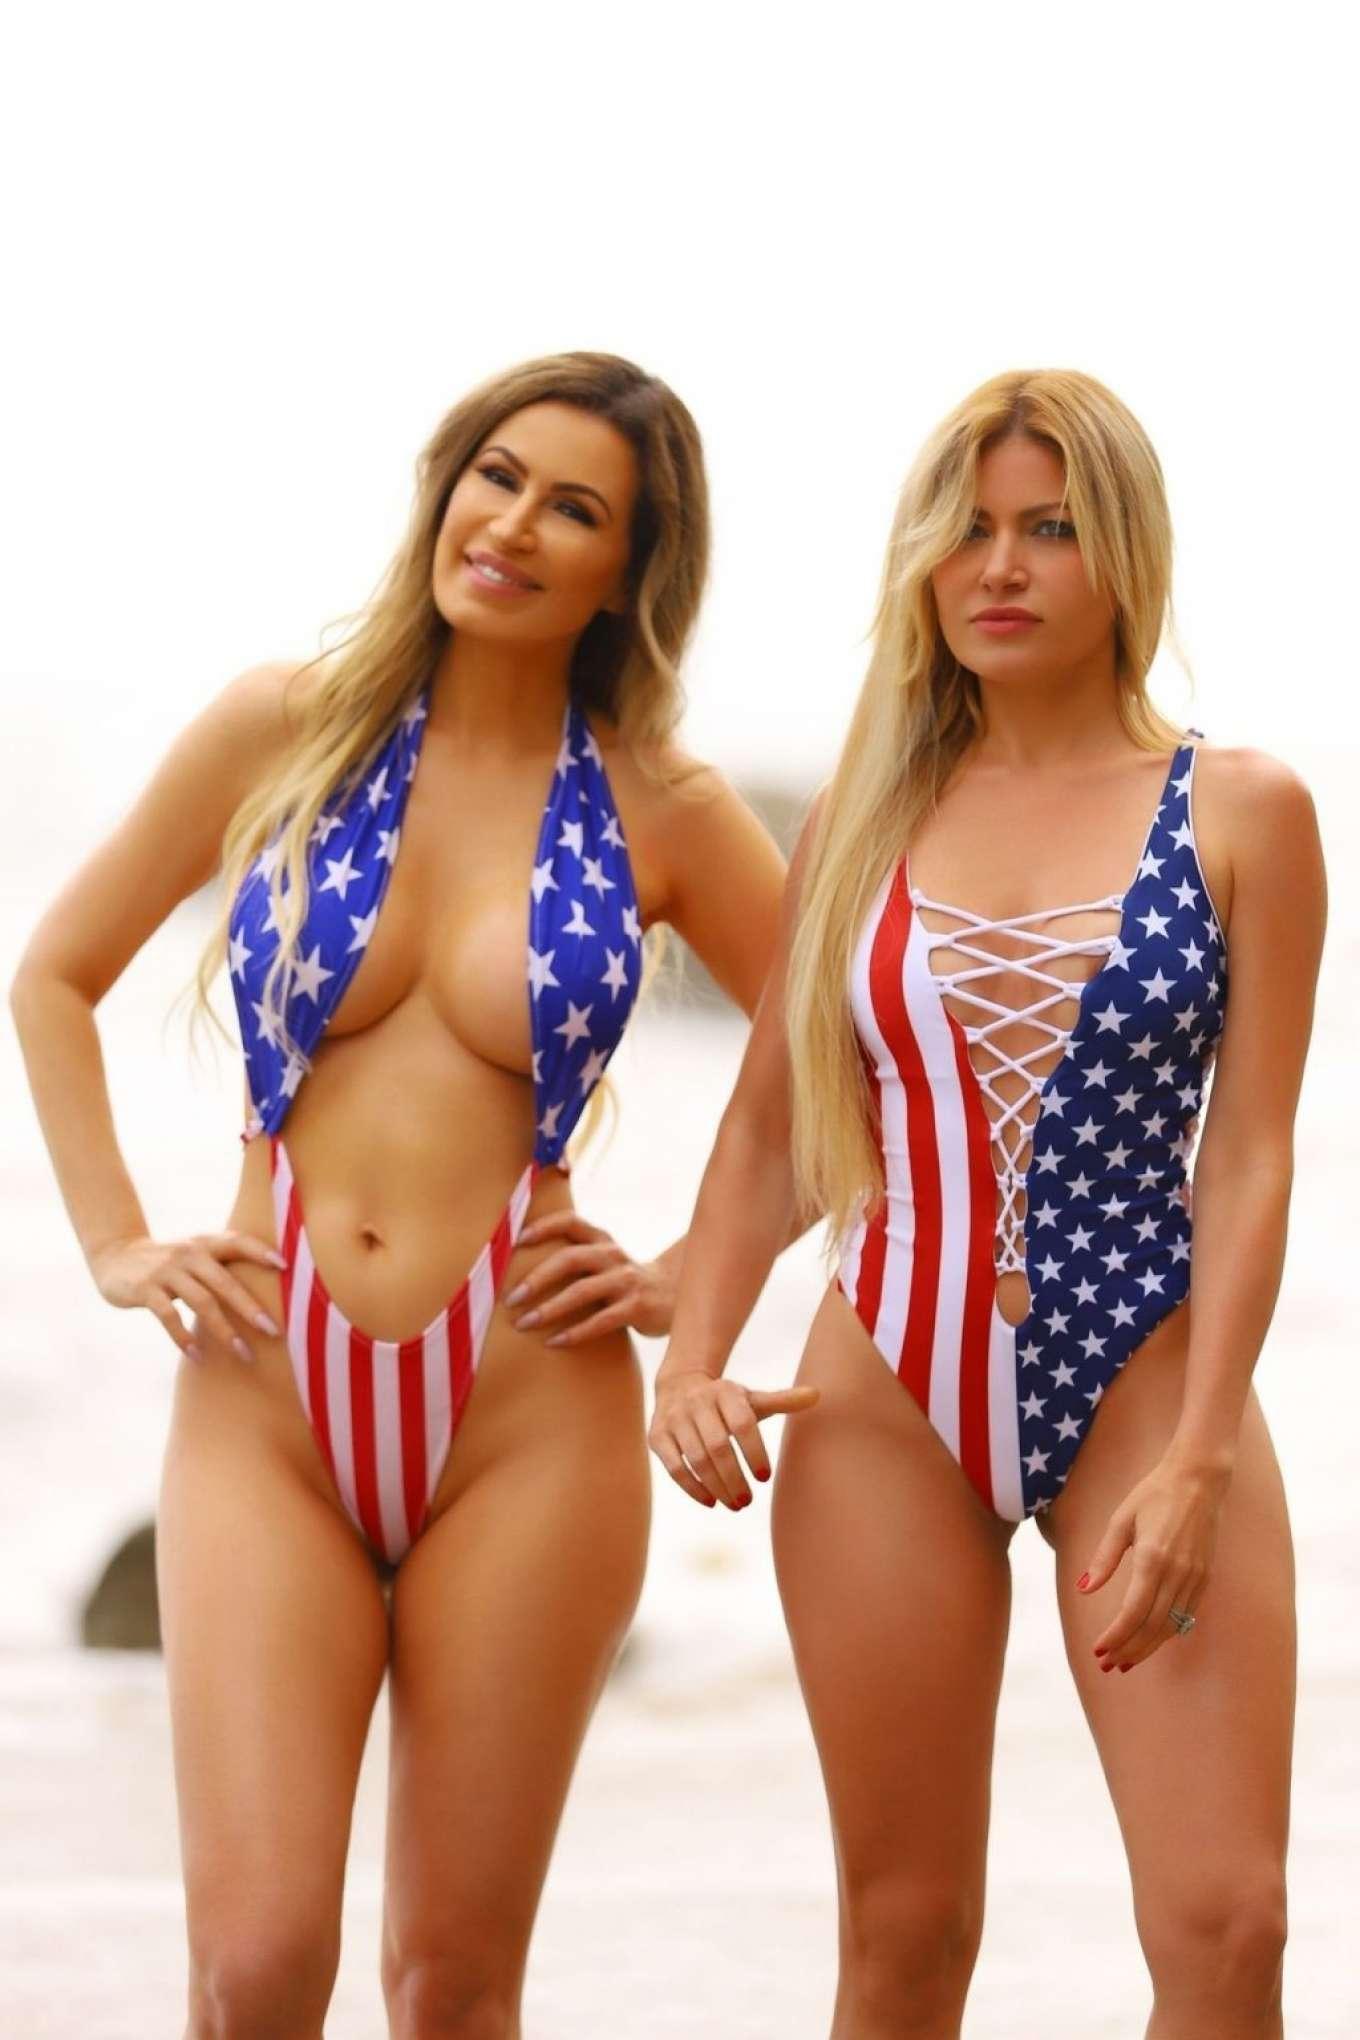 Ana Braga and Simona Papadopoulos in Swimsuit on the beach in Malibu